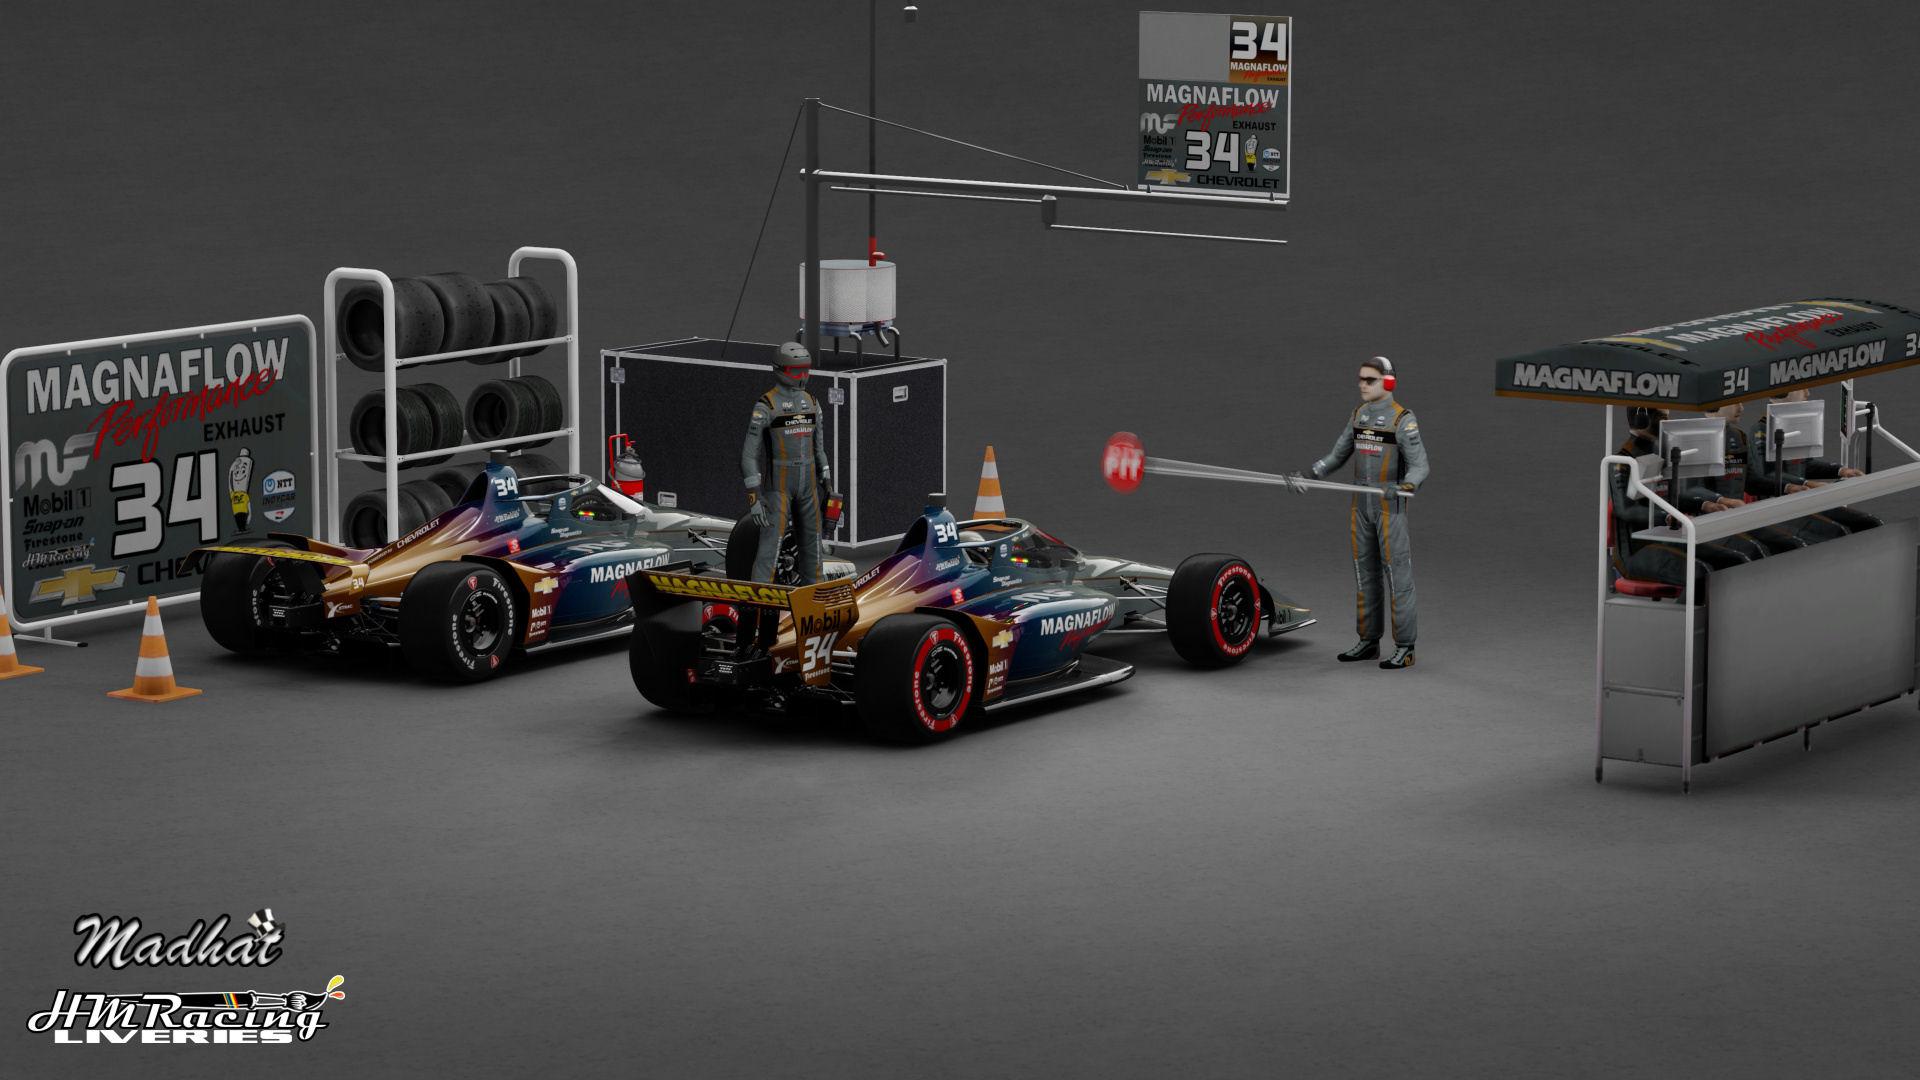 MAGNAFLOW 34 IndyCar Madhat HMRacing Liveries 05.jpg